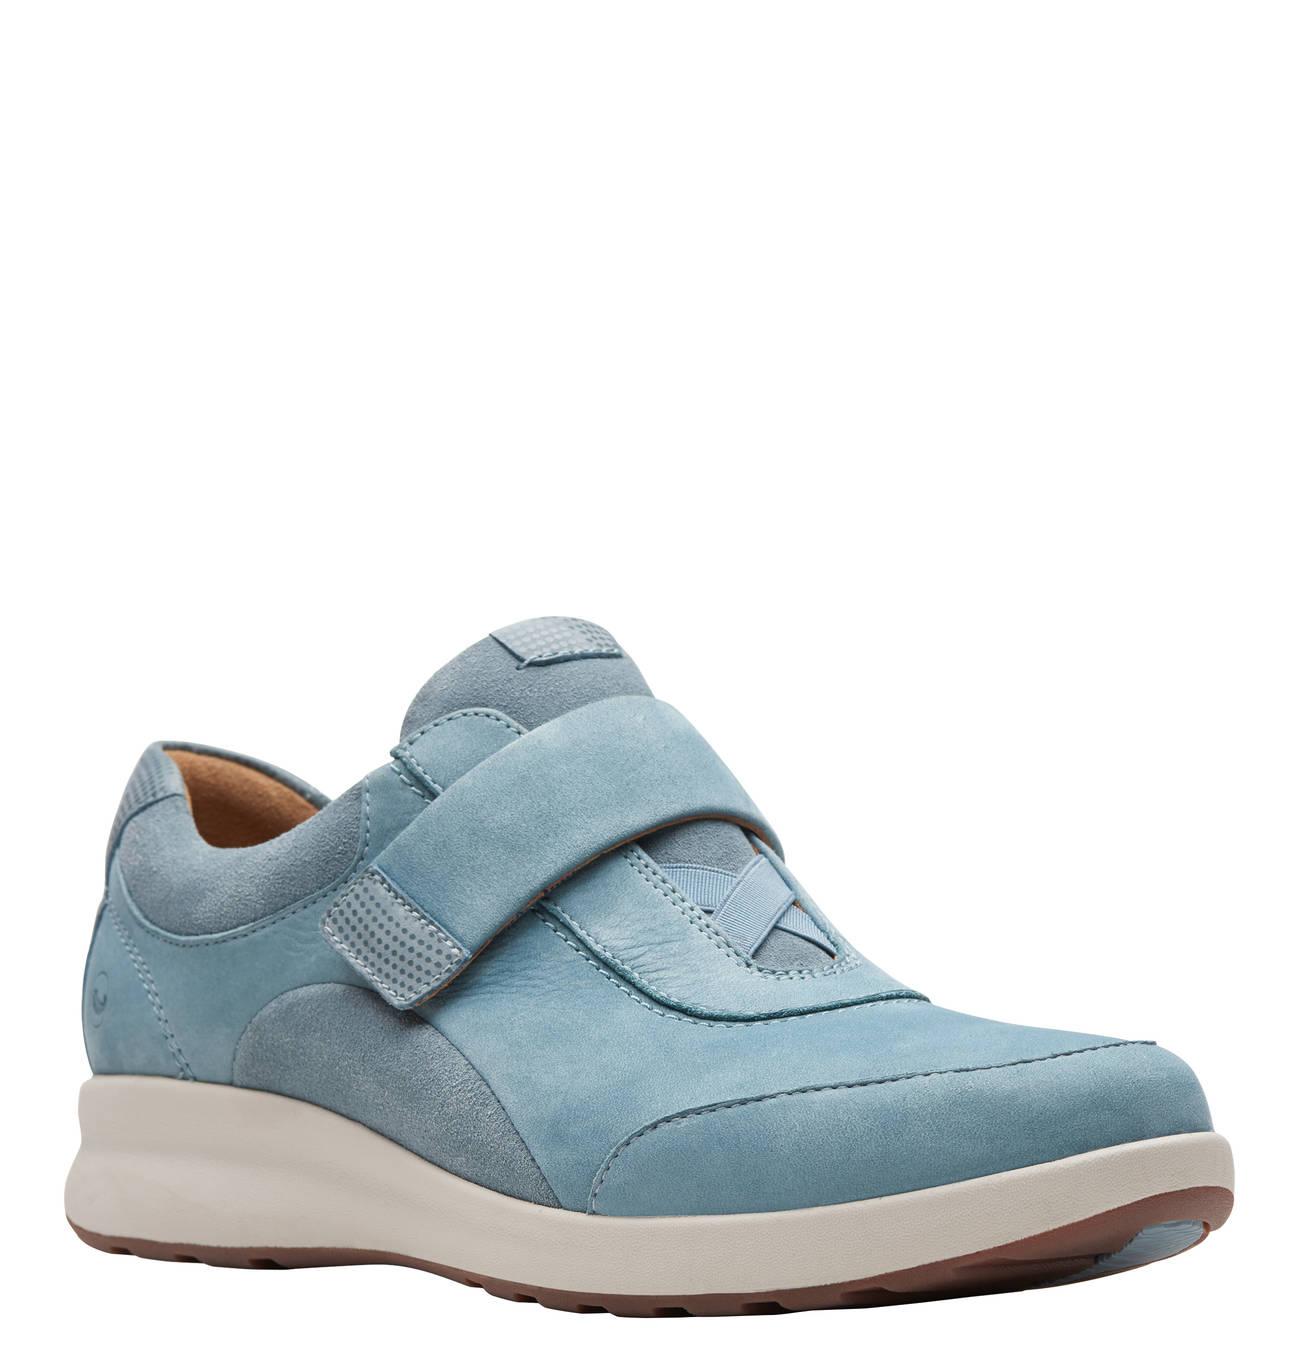 Paul Green Damen Sneaker weiß 41 12   GALERIA Karstadt Kaufhof